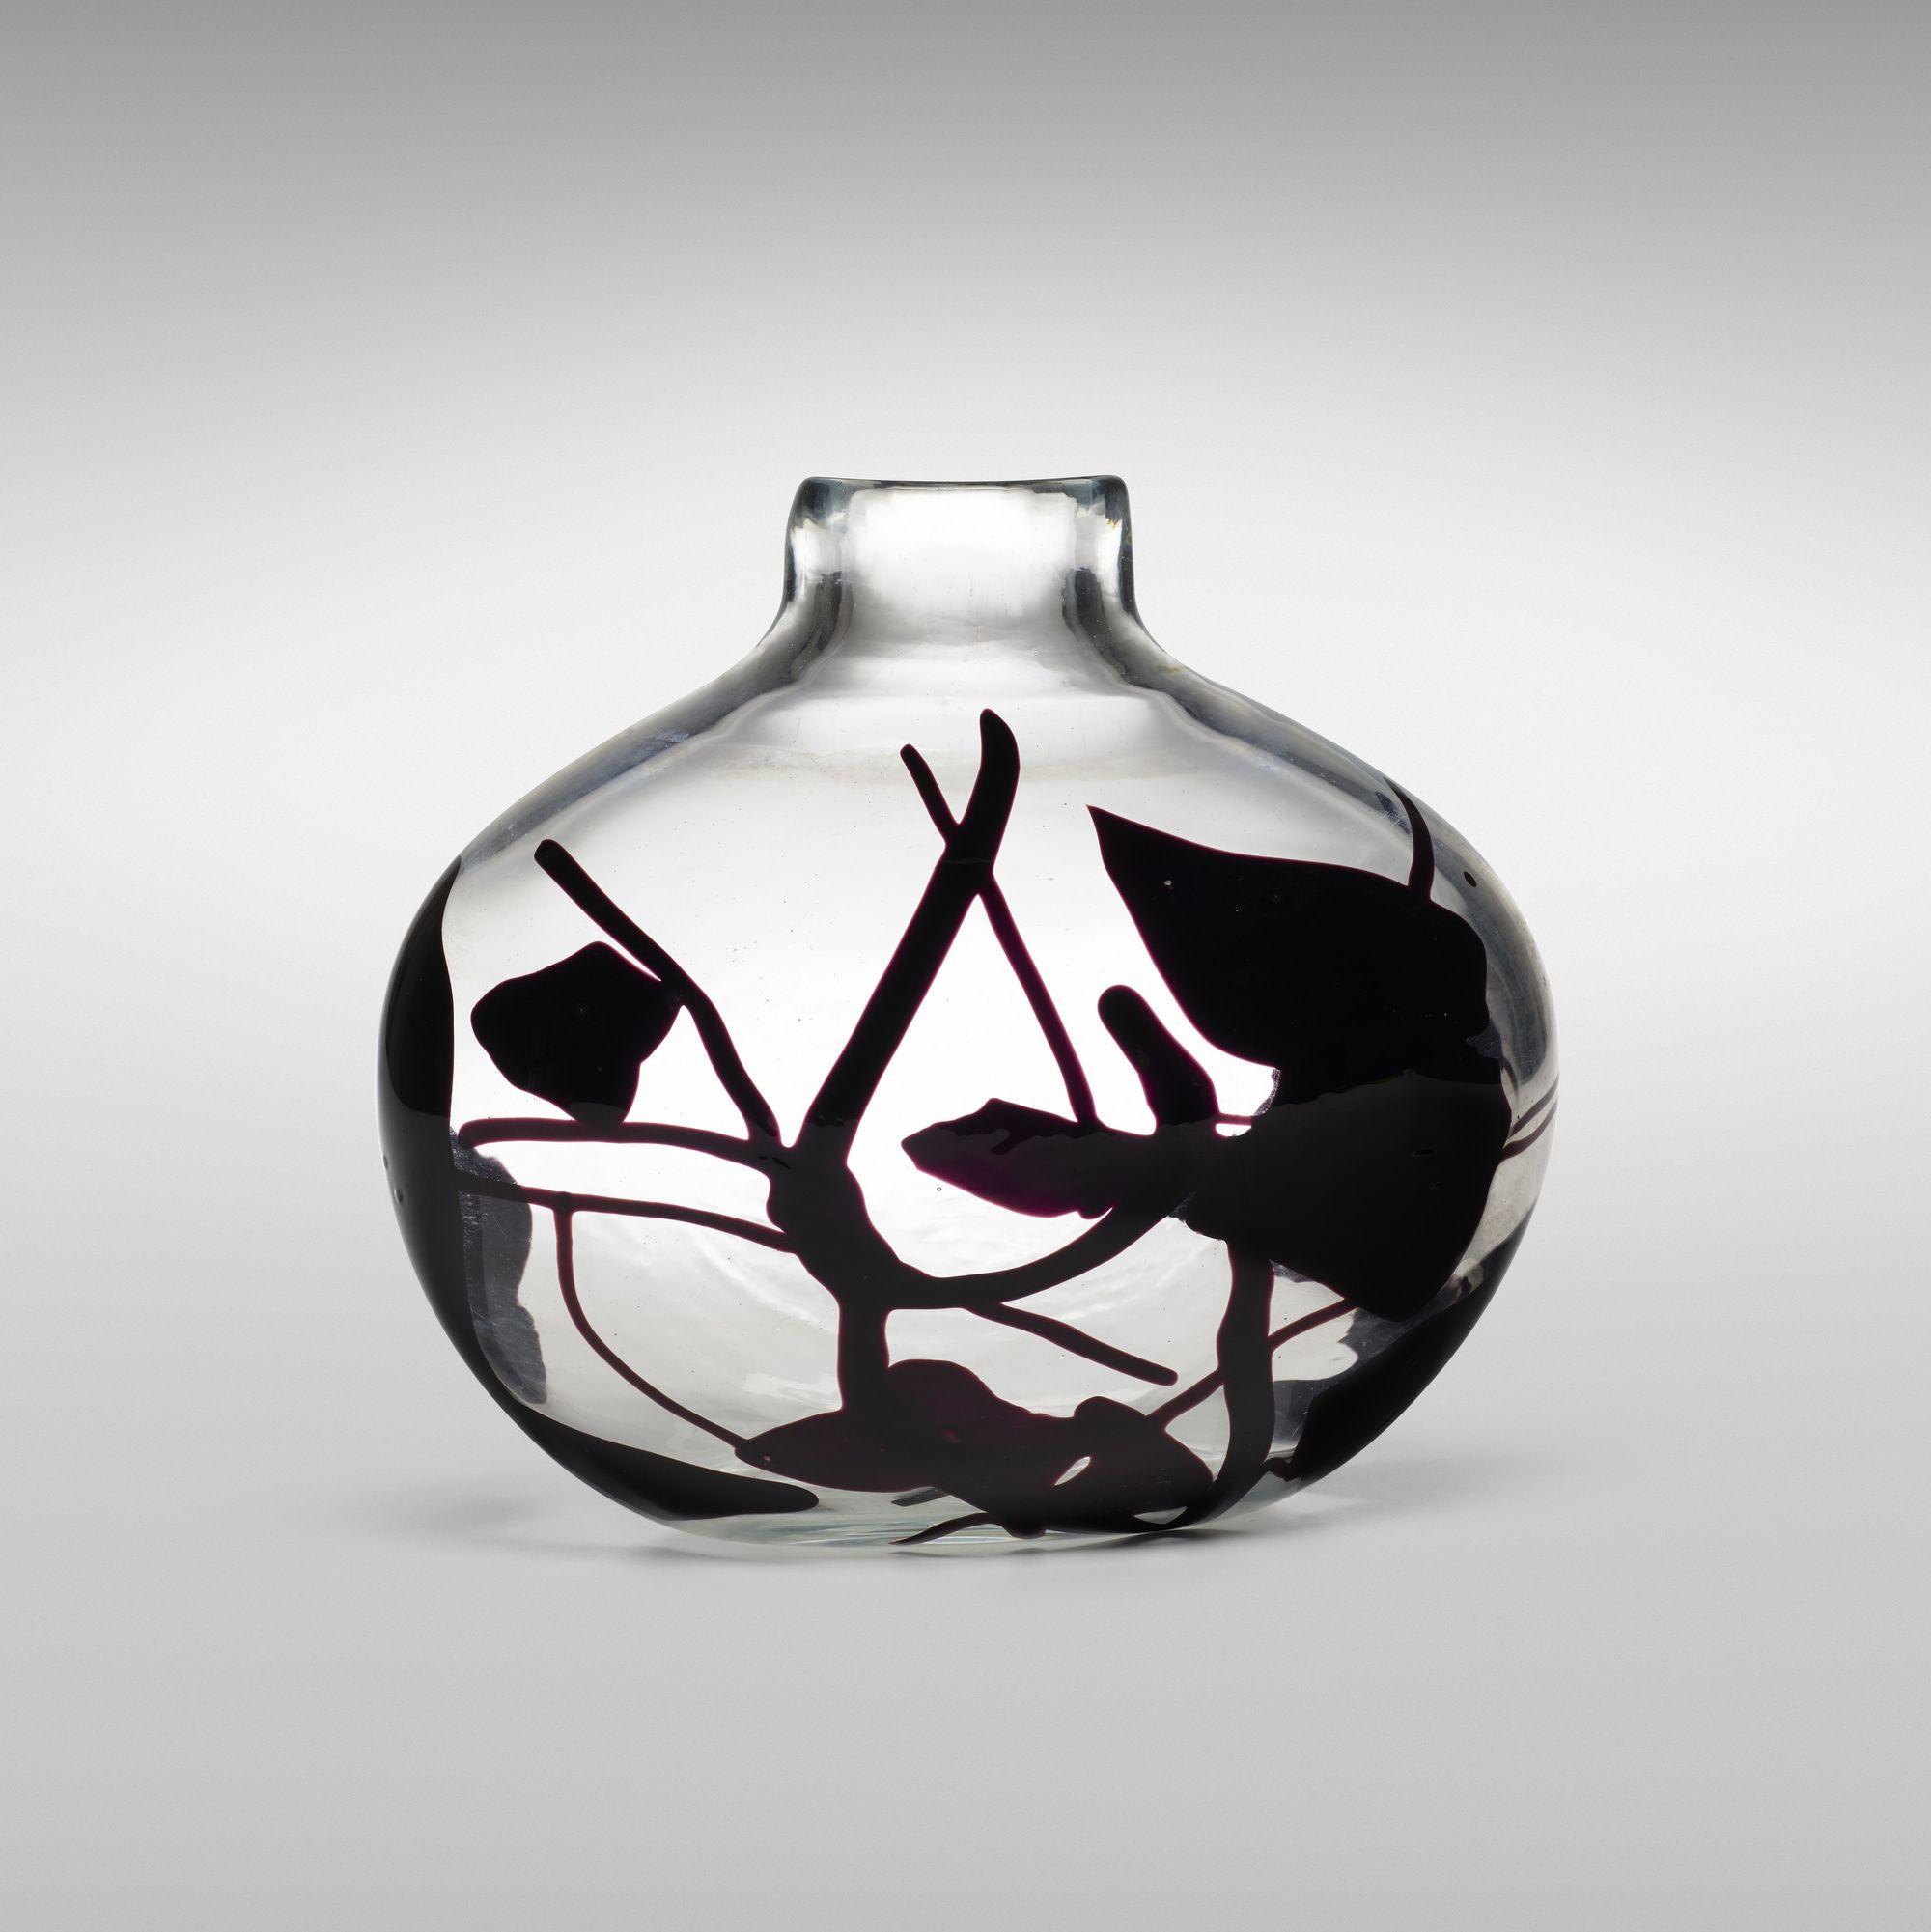 14 Fashionable Roman Vase for Sale 2021 free download roman vase for sale of 19 vase art competition 2018 the weekly world pertaining to 139 fulvio bianconi important con macchie vase model 4324